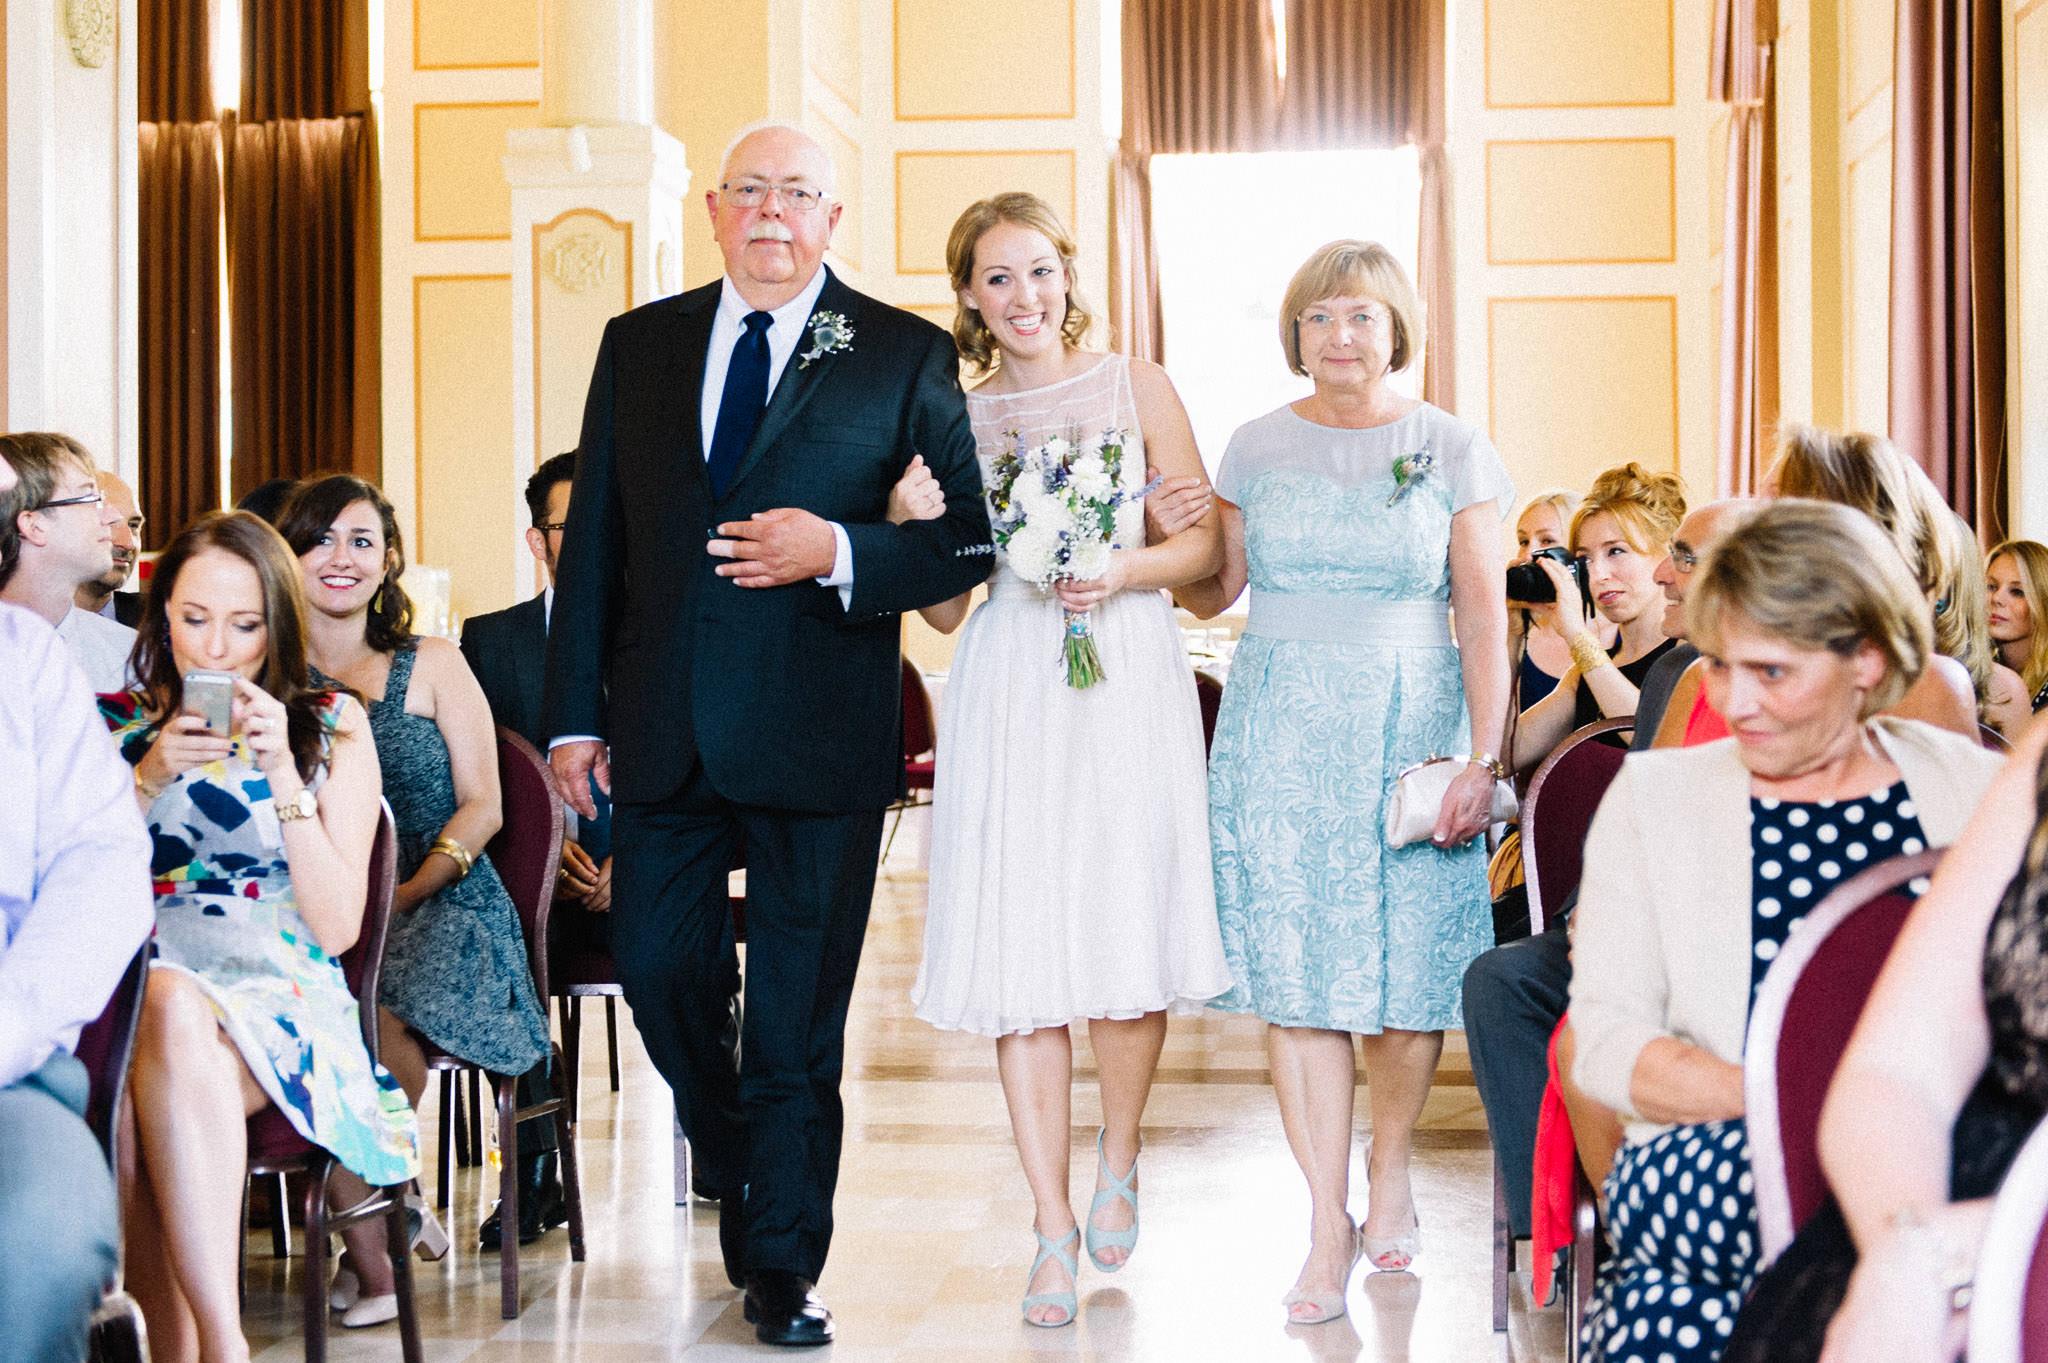 Heritage Hall Vancouver wedding ceremony